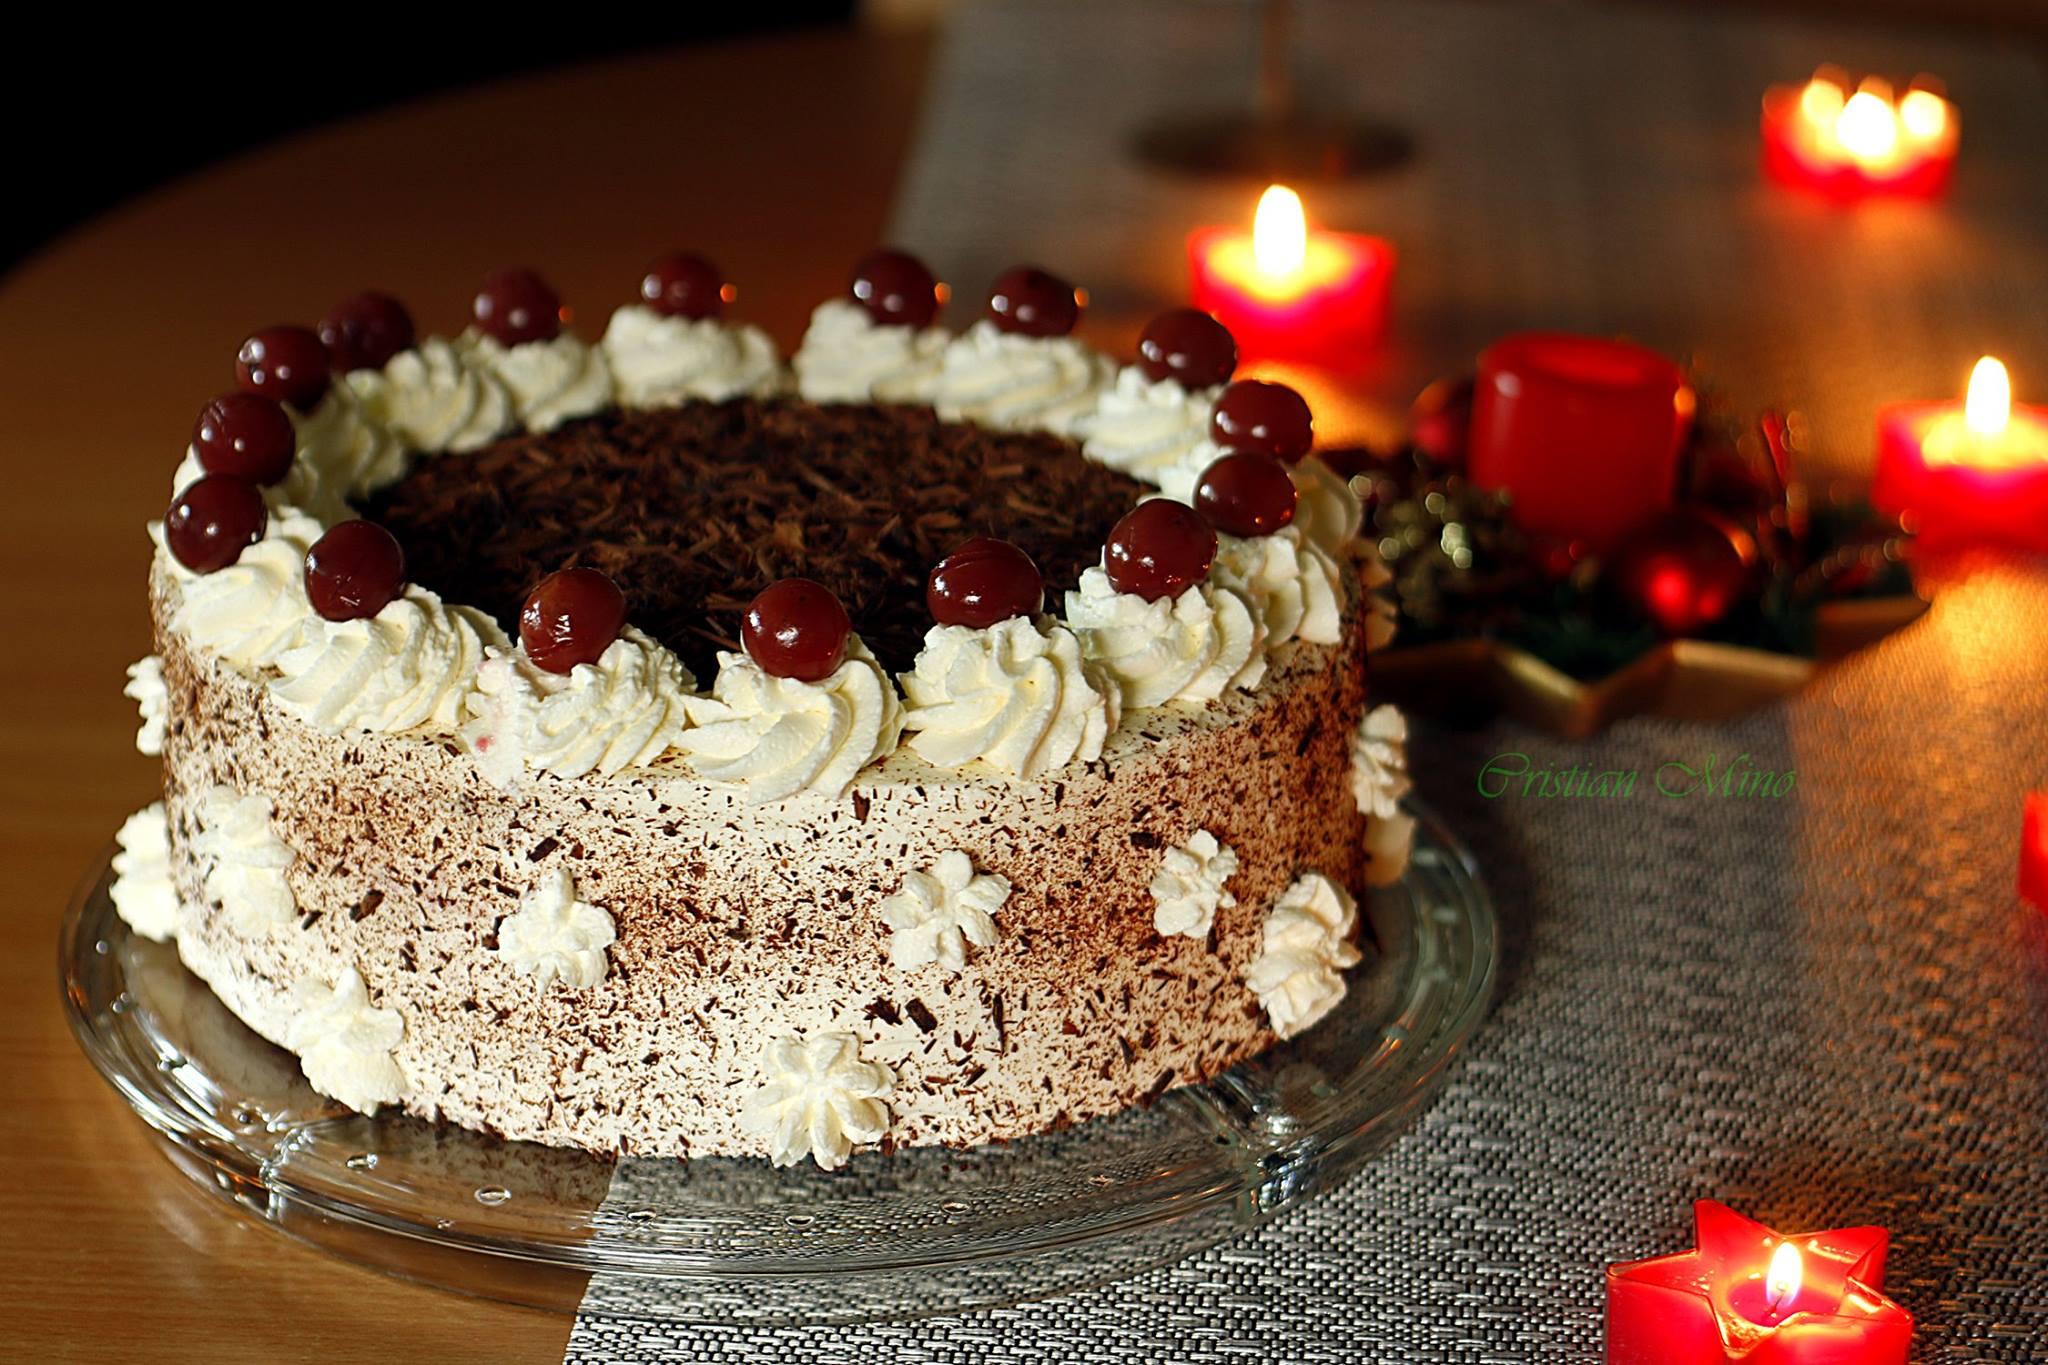 tort padurea neagra by cristian mino 2